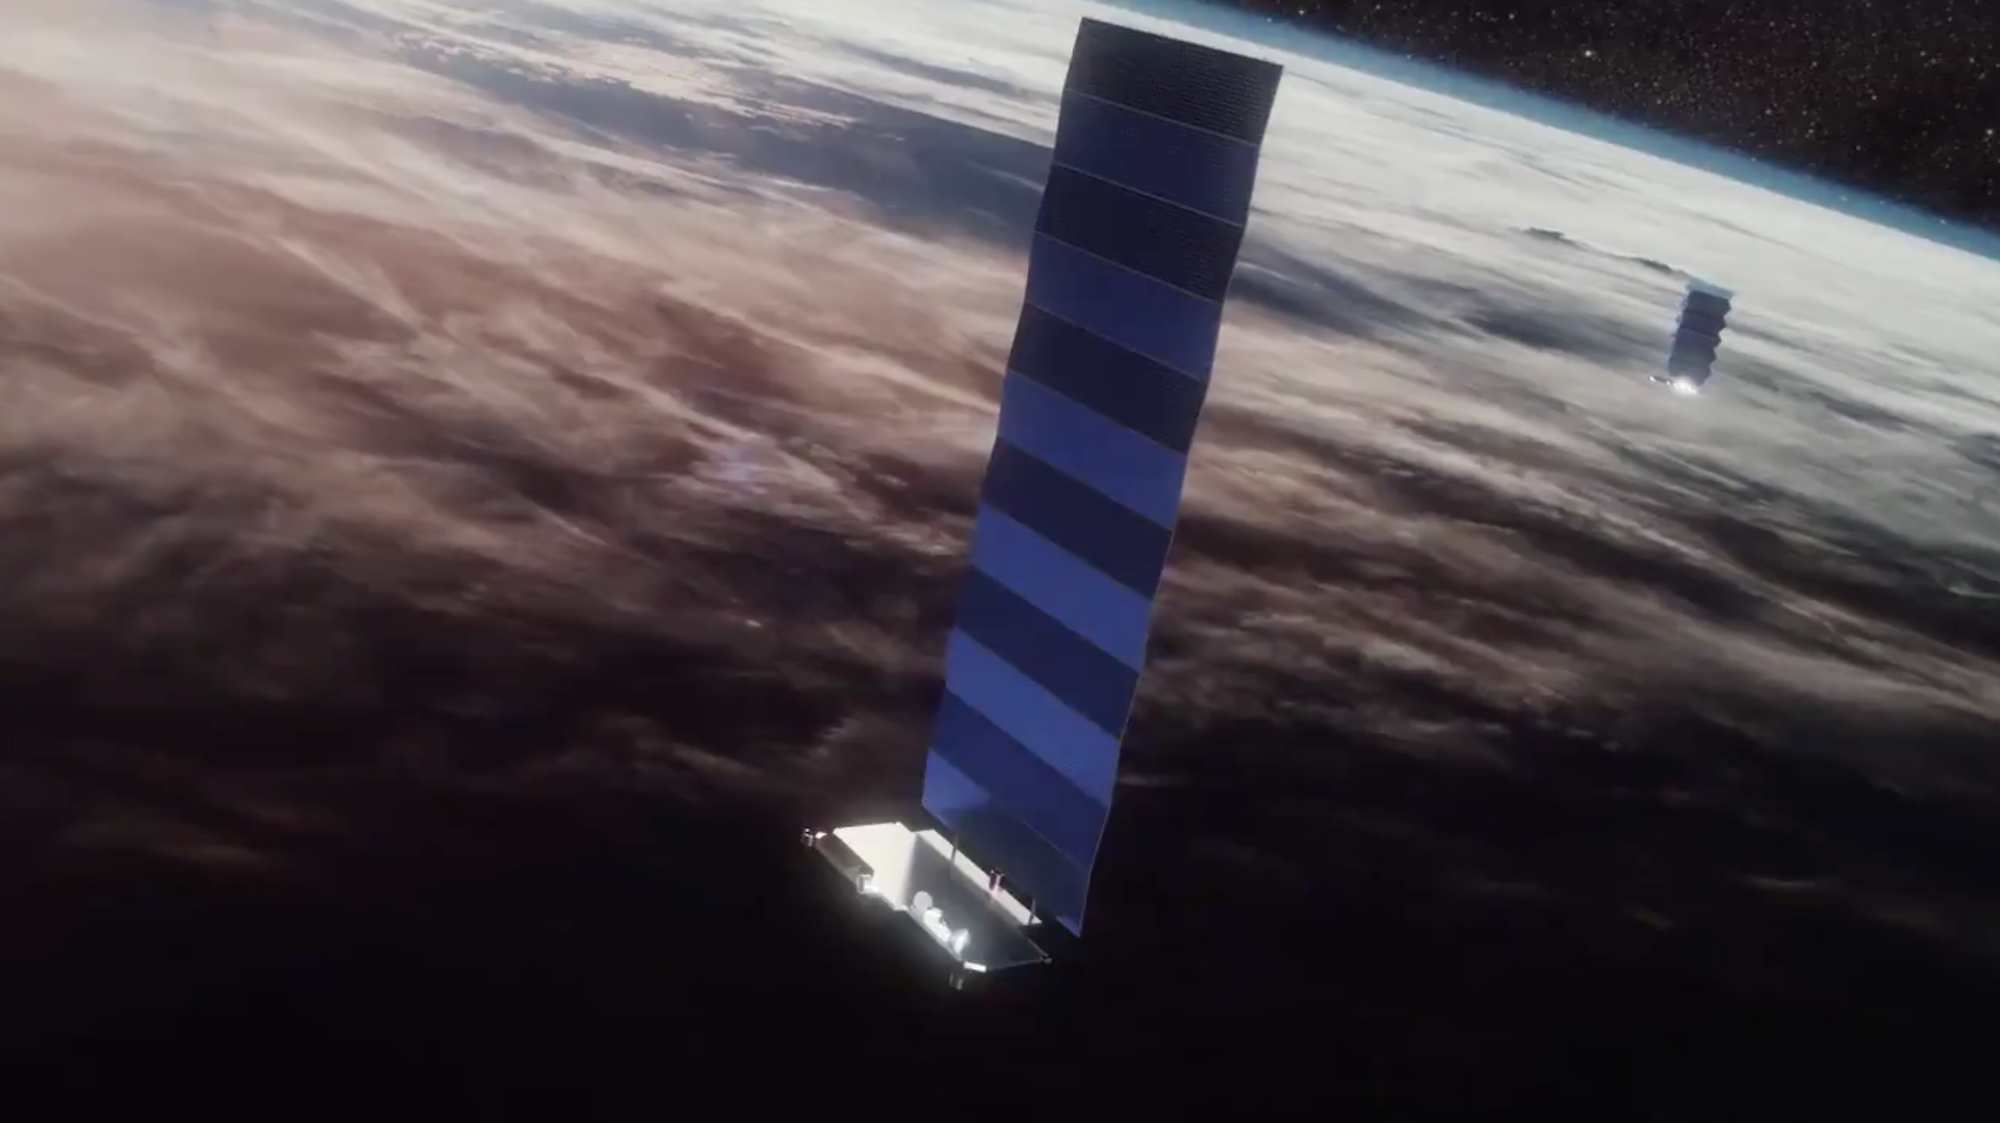 SpaceX raises $850 million